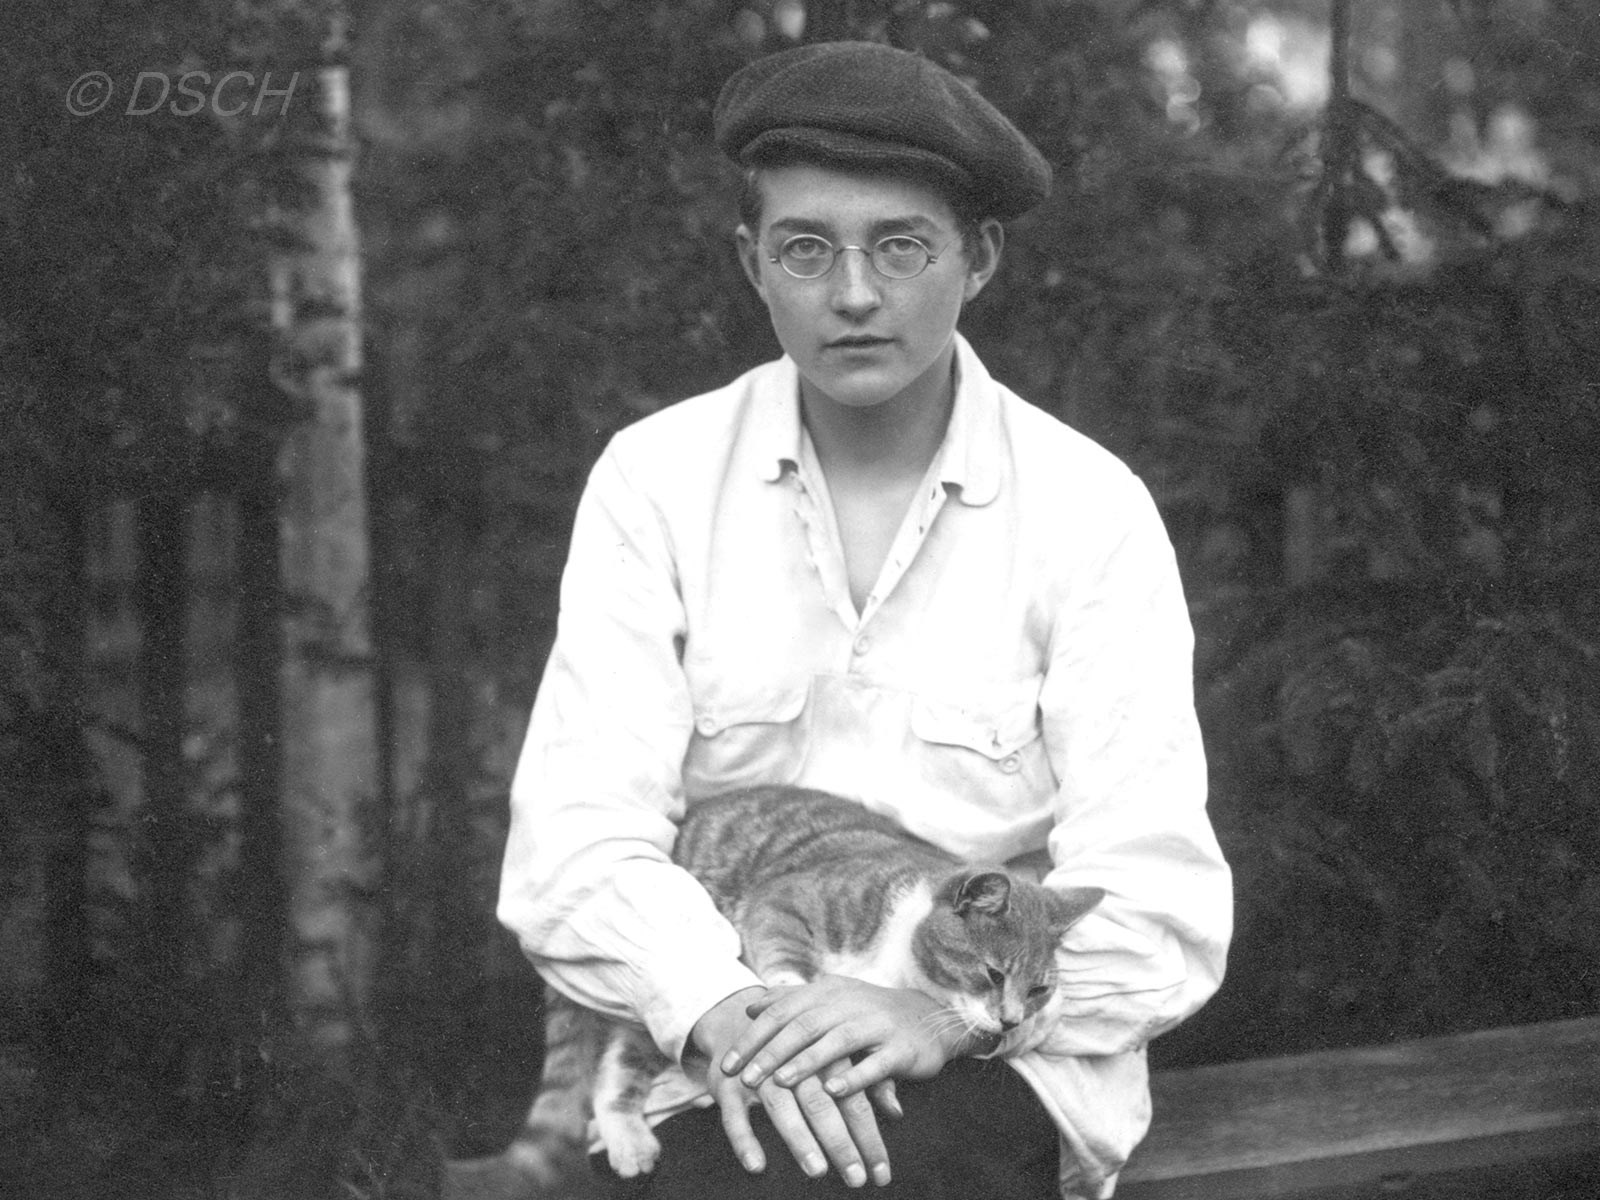 За два дня до окончания Первой симфонии. 28 июня 1925 года. Фото с сайта shostakovich.ru